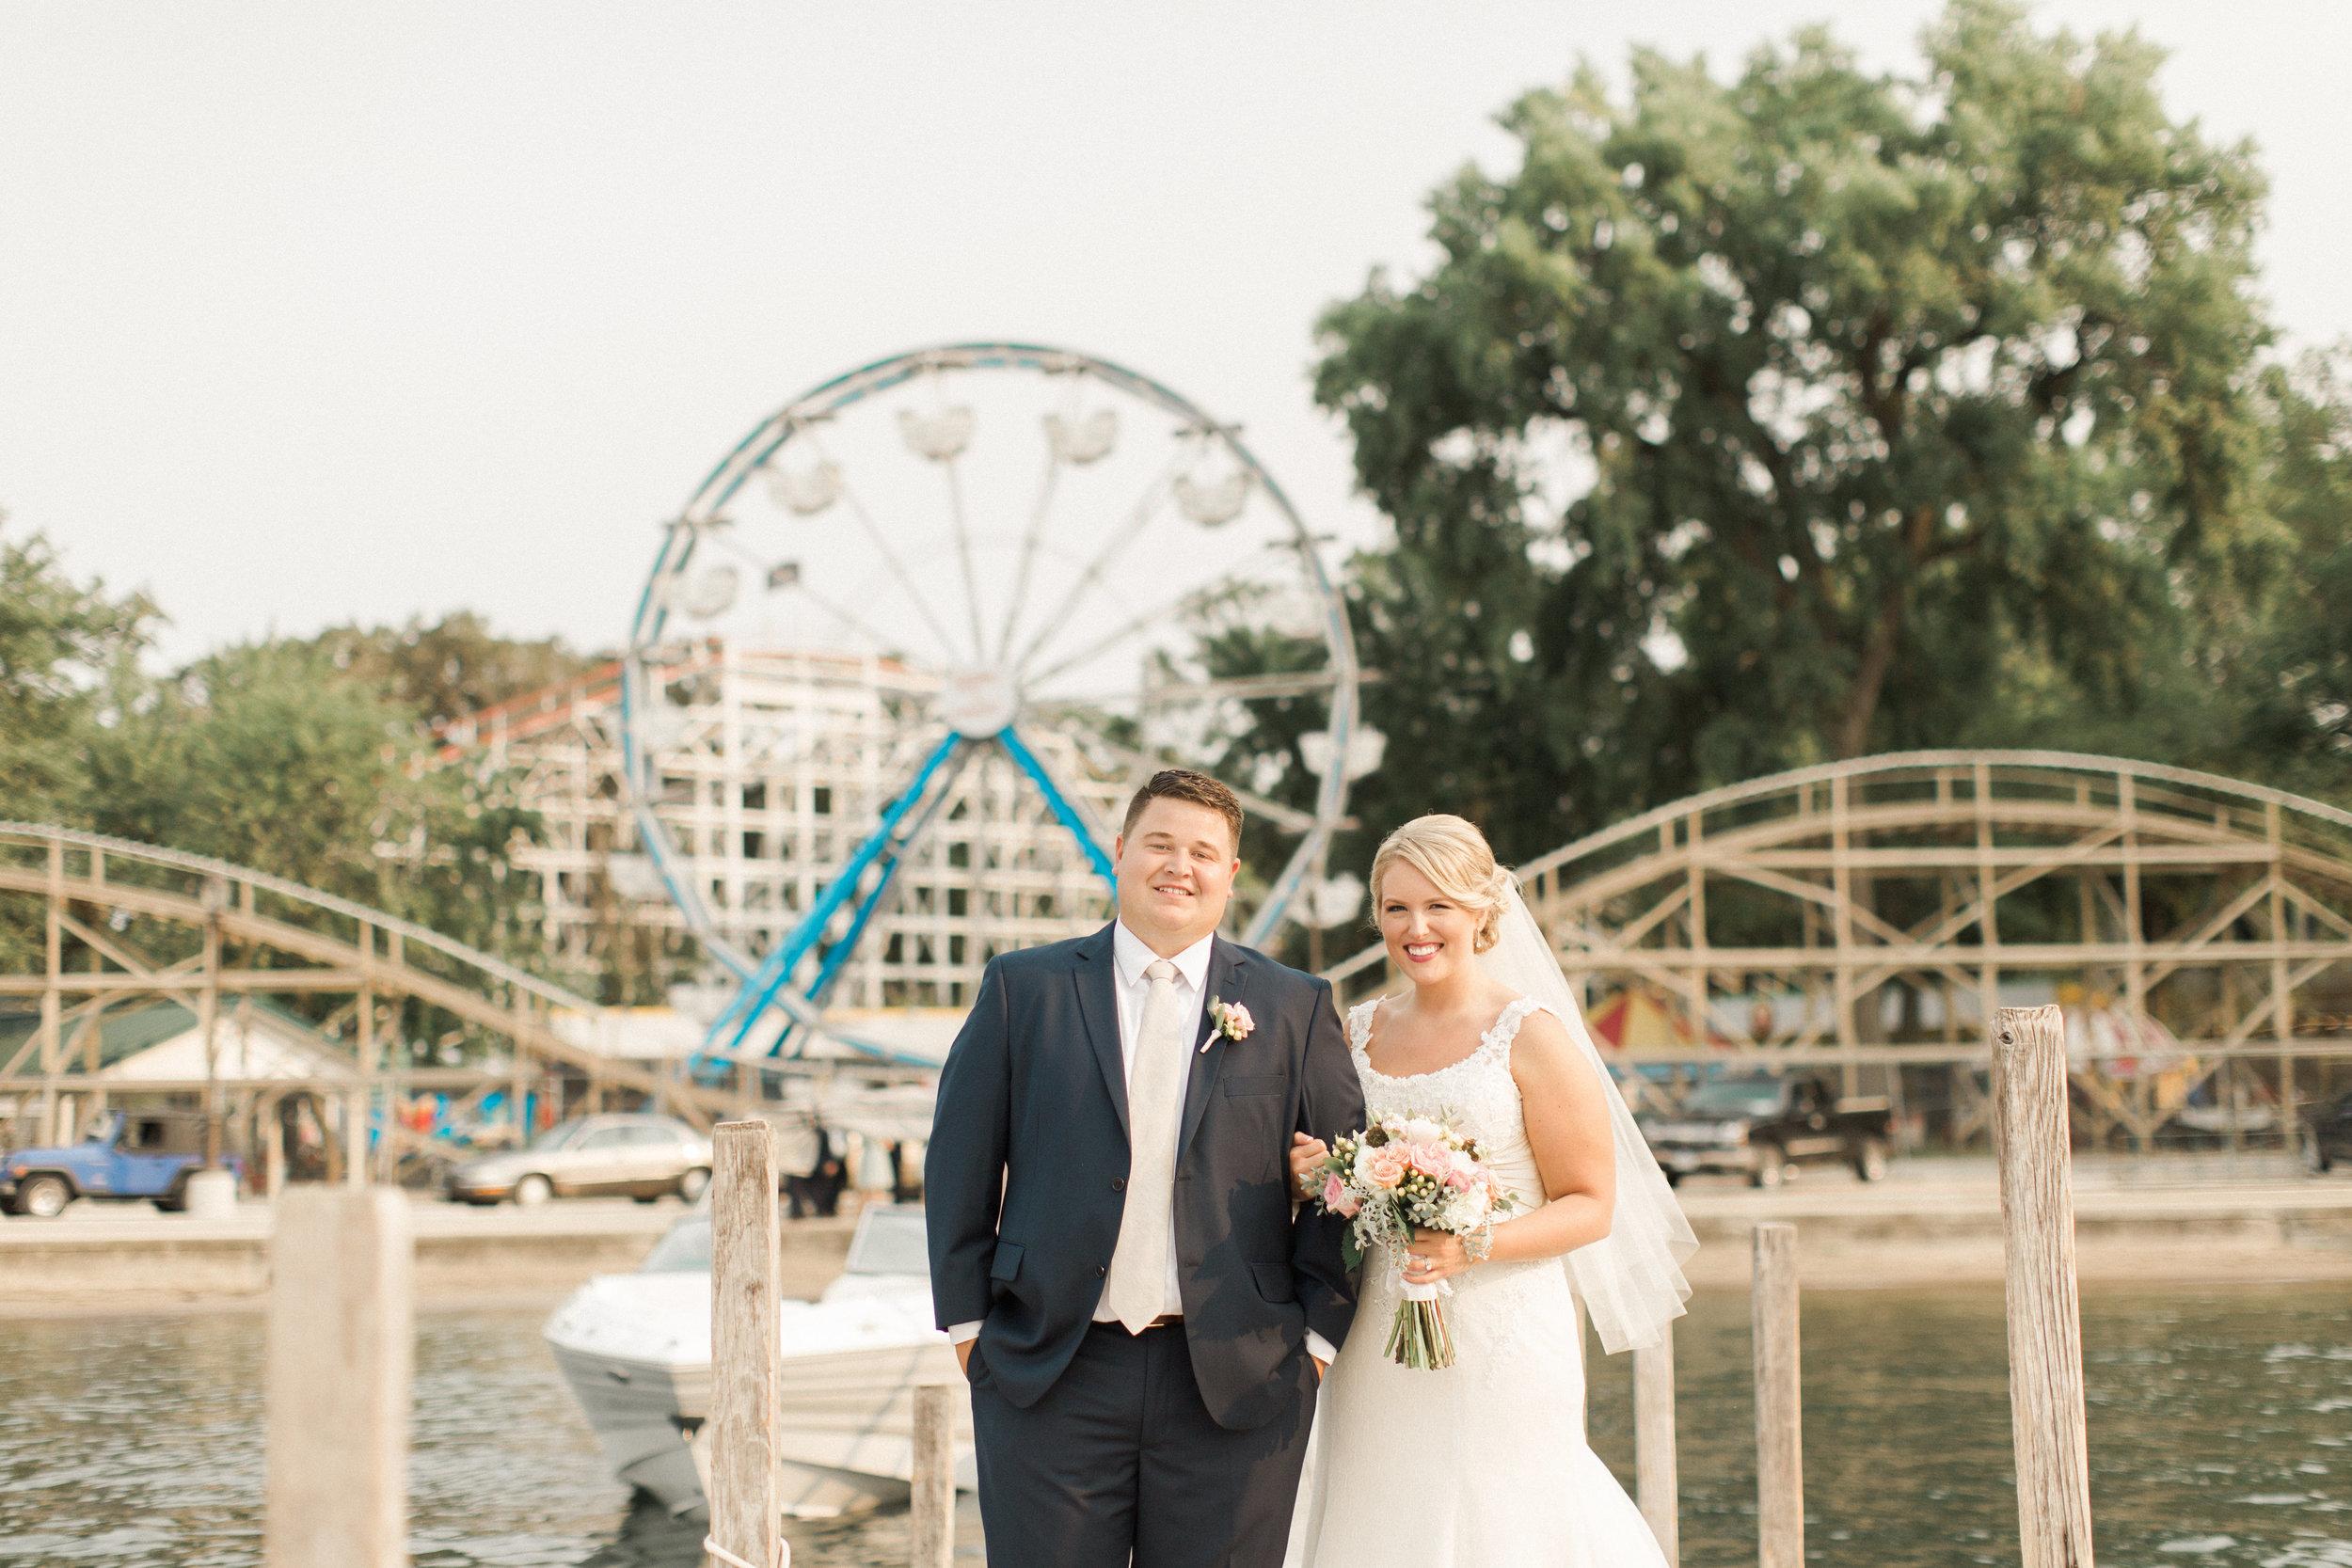 the Wedding-0612.jpg